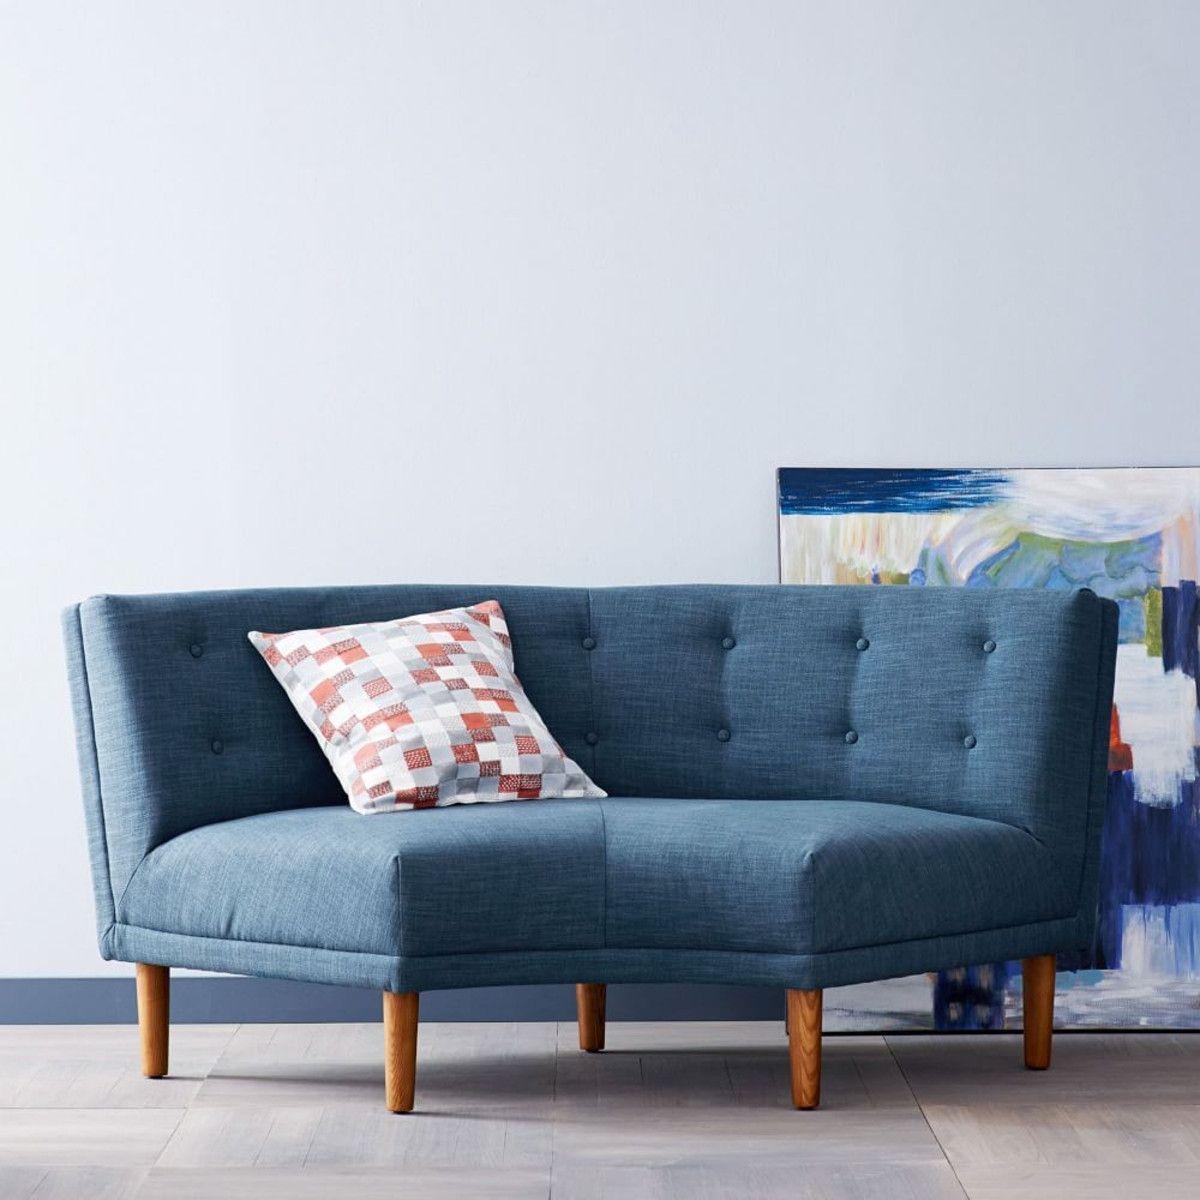 Beau Rounded Retro Curved Sofa